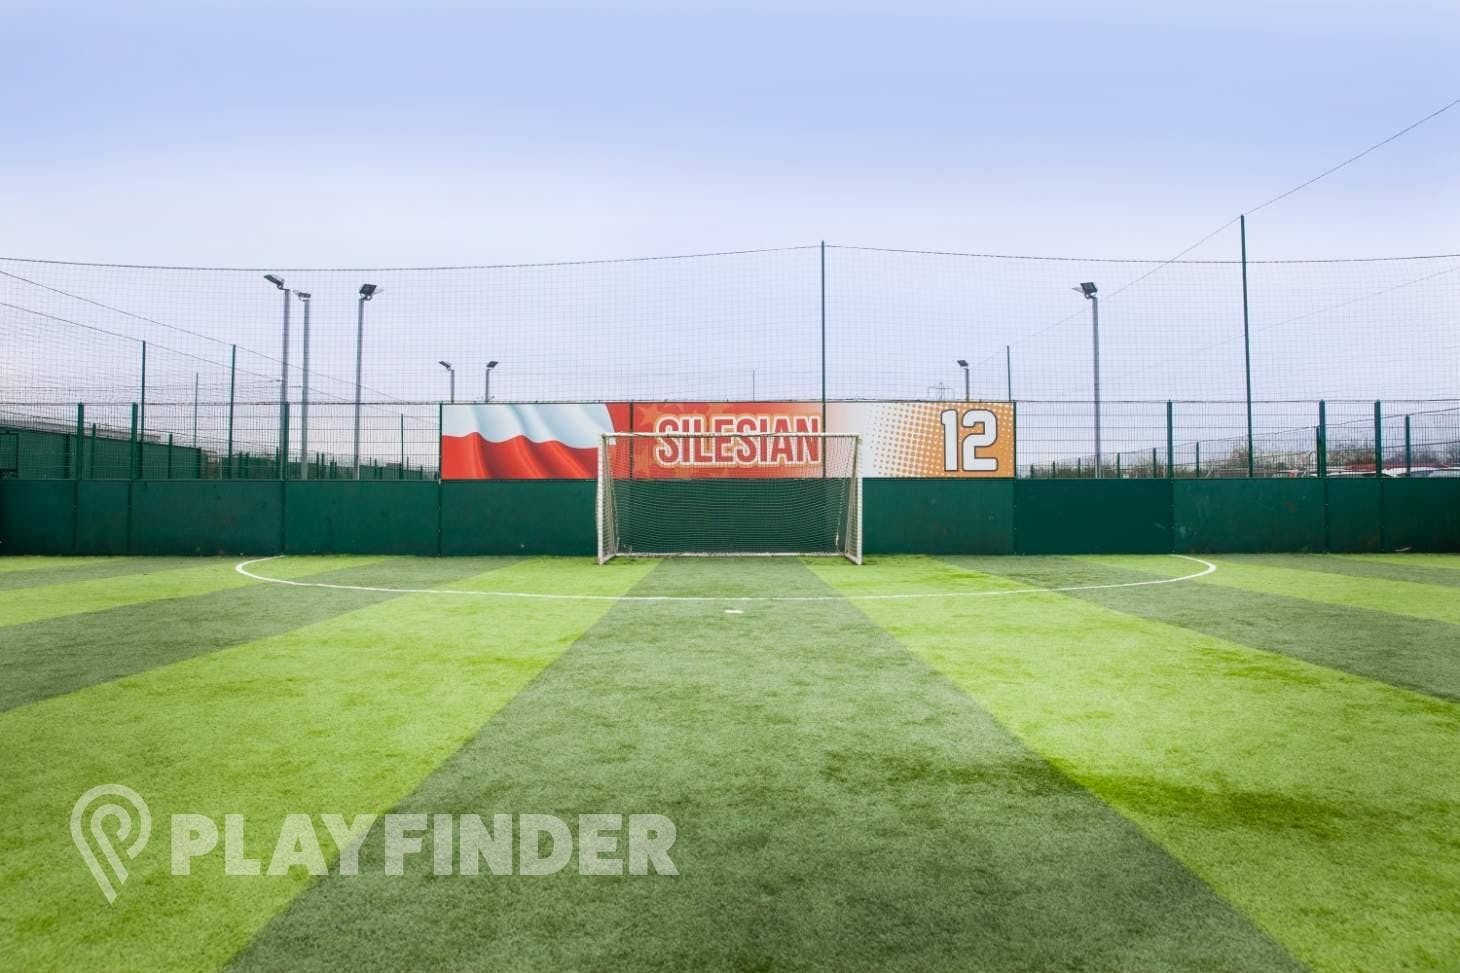 Goals Dartford 7 a side | 3G Astroturf football pitch